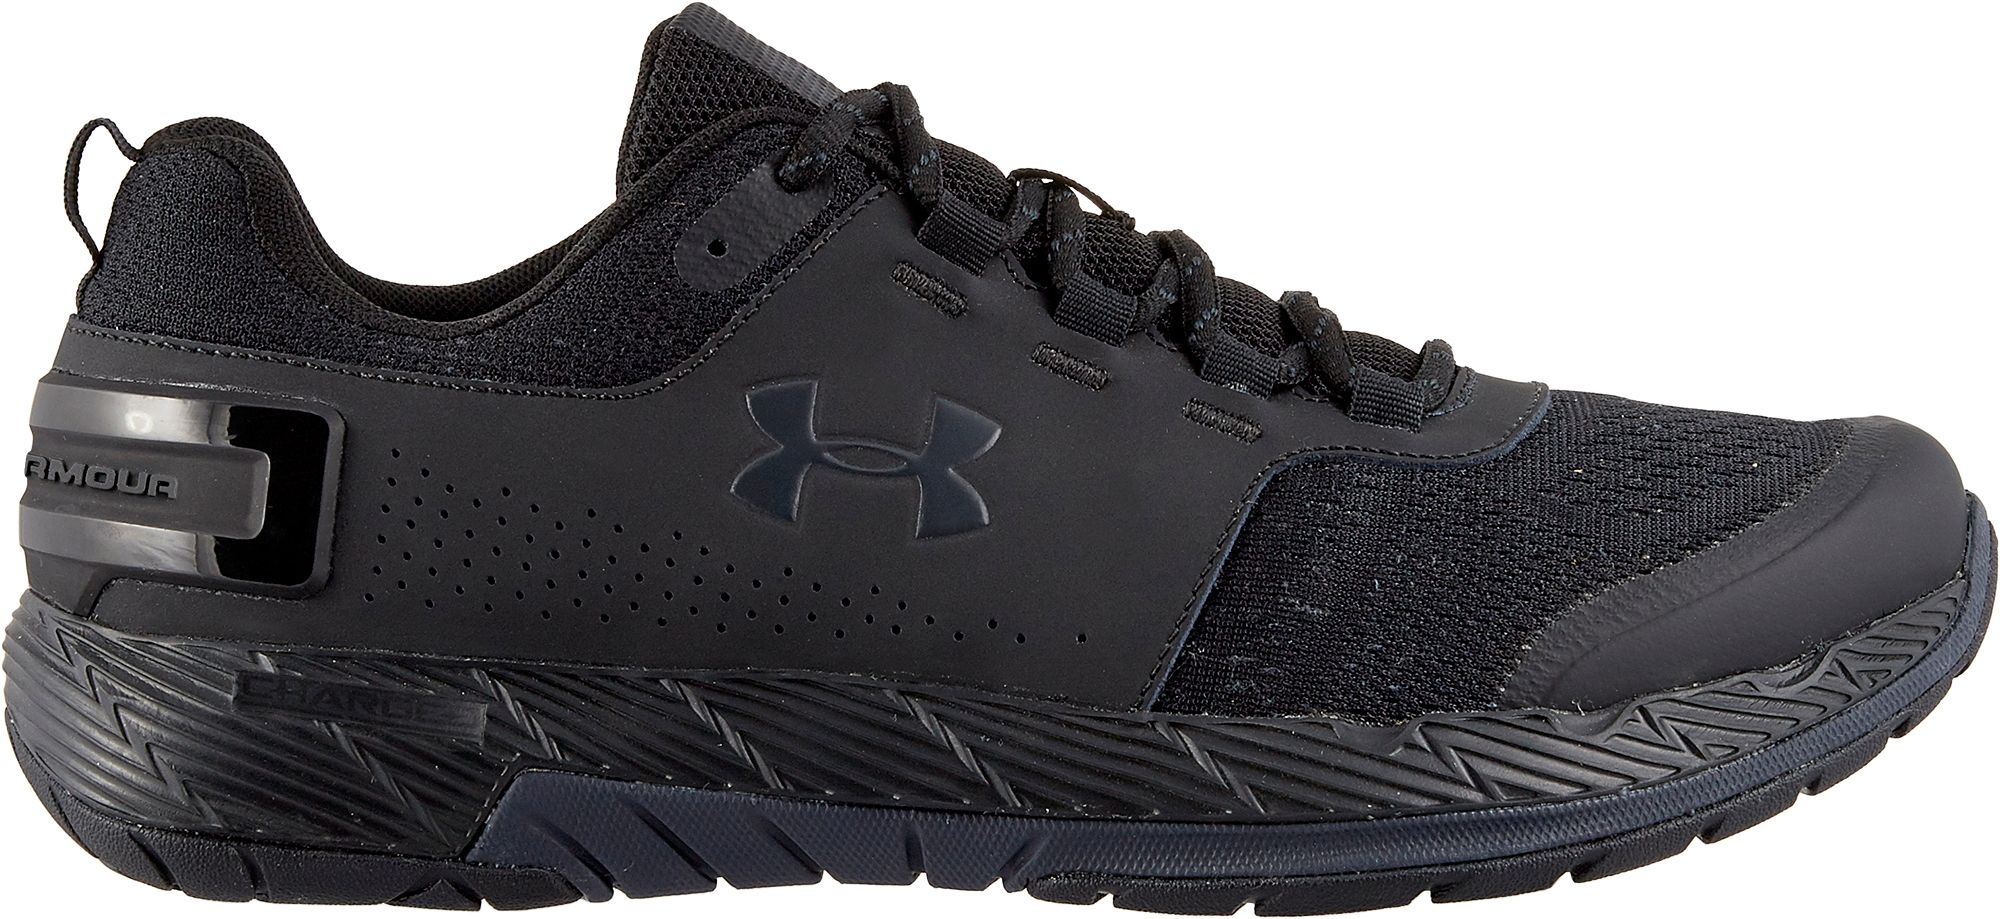 Commit TR Ex Training Shoes - Walmart